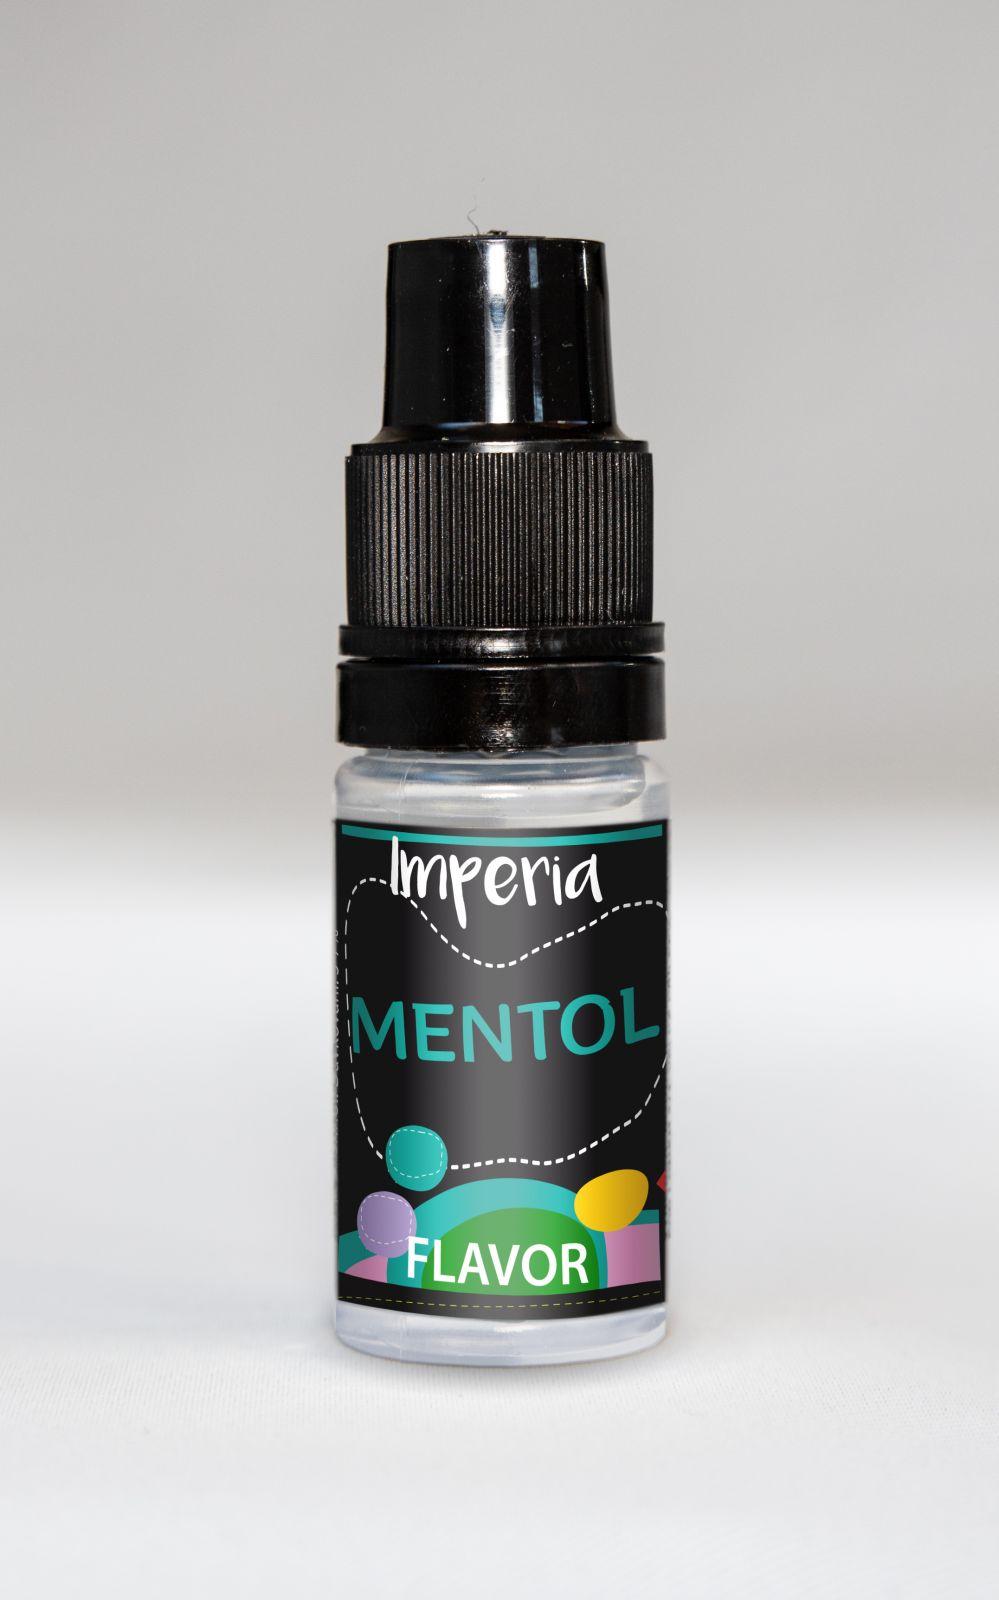 MENTOL - Aroma Imperia Black Label Boudoir Samadhi s.r.o.